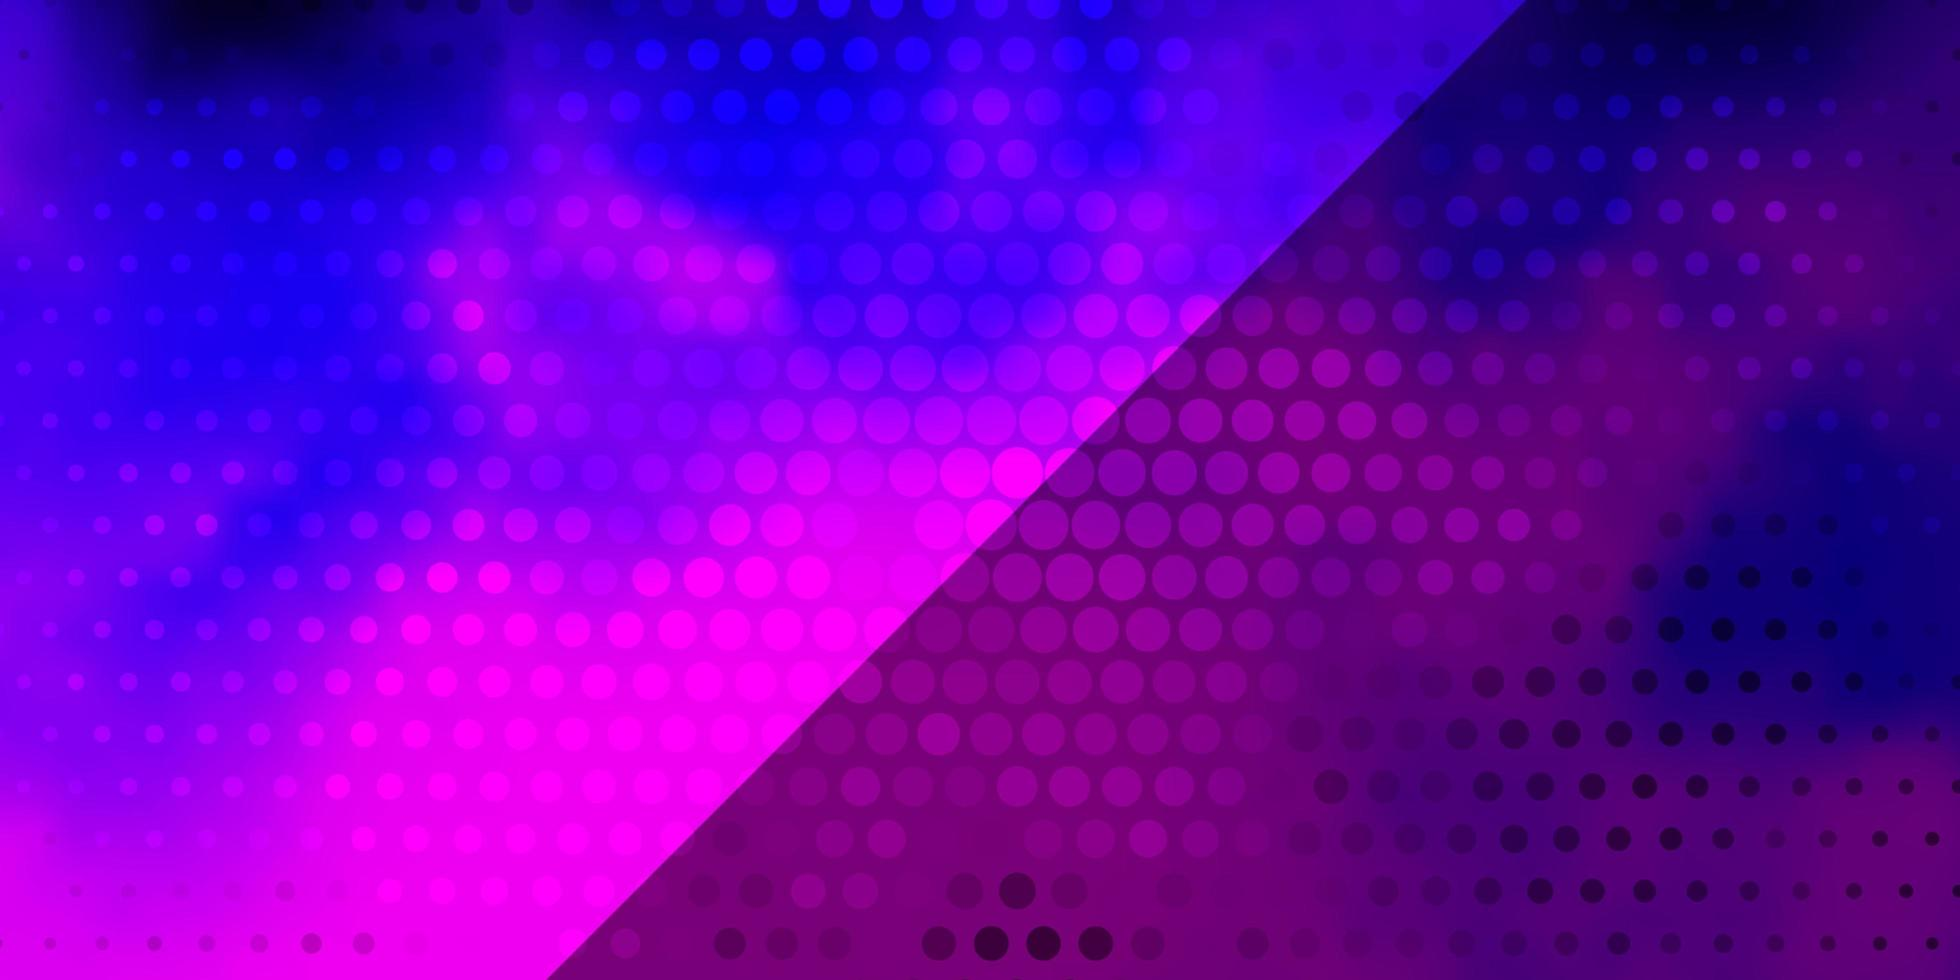 layout de vetor roxo, rosa claro com círculos.